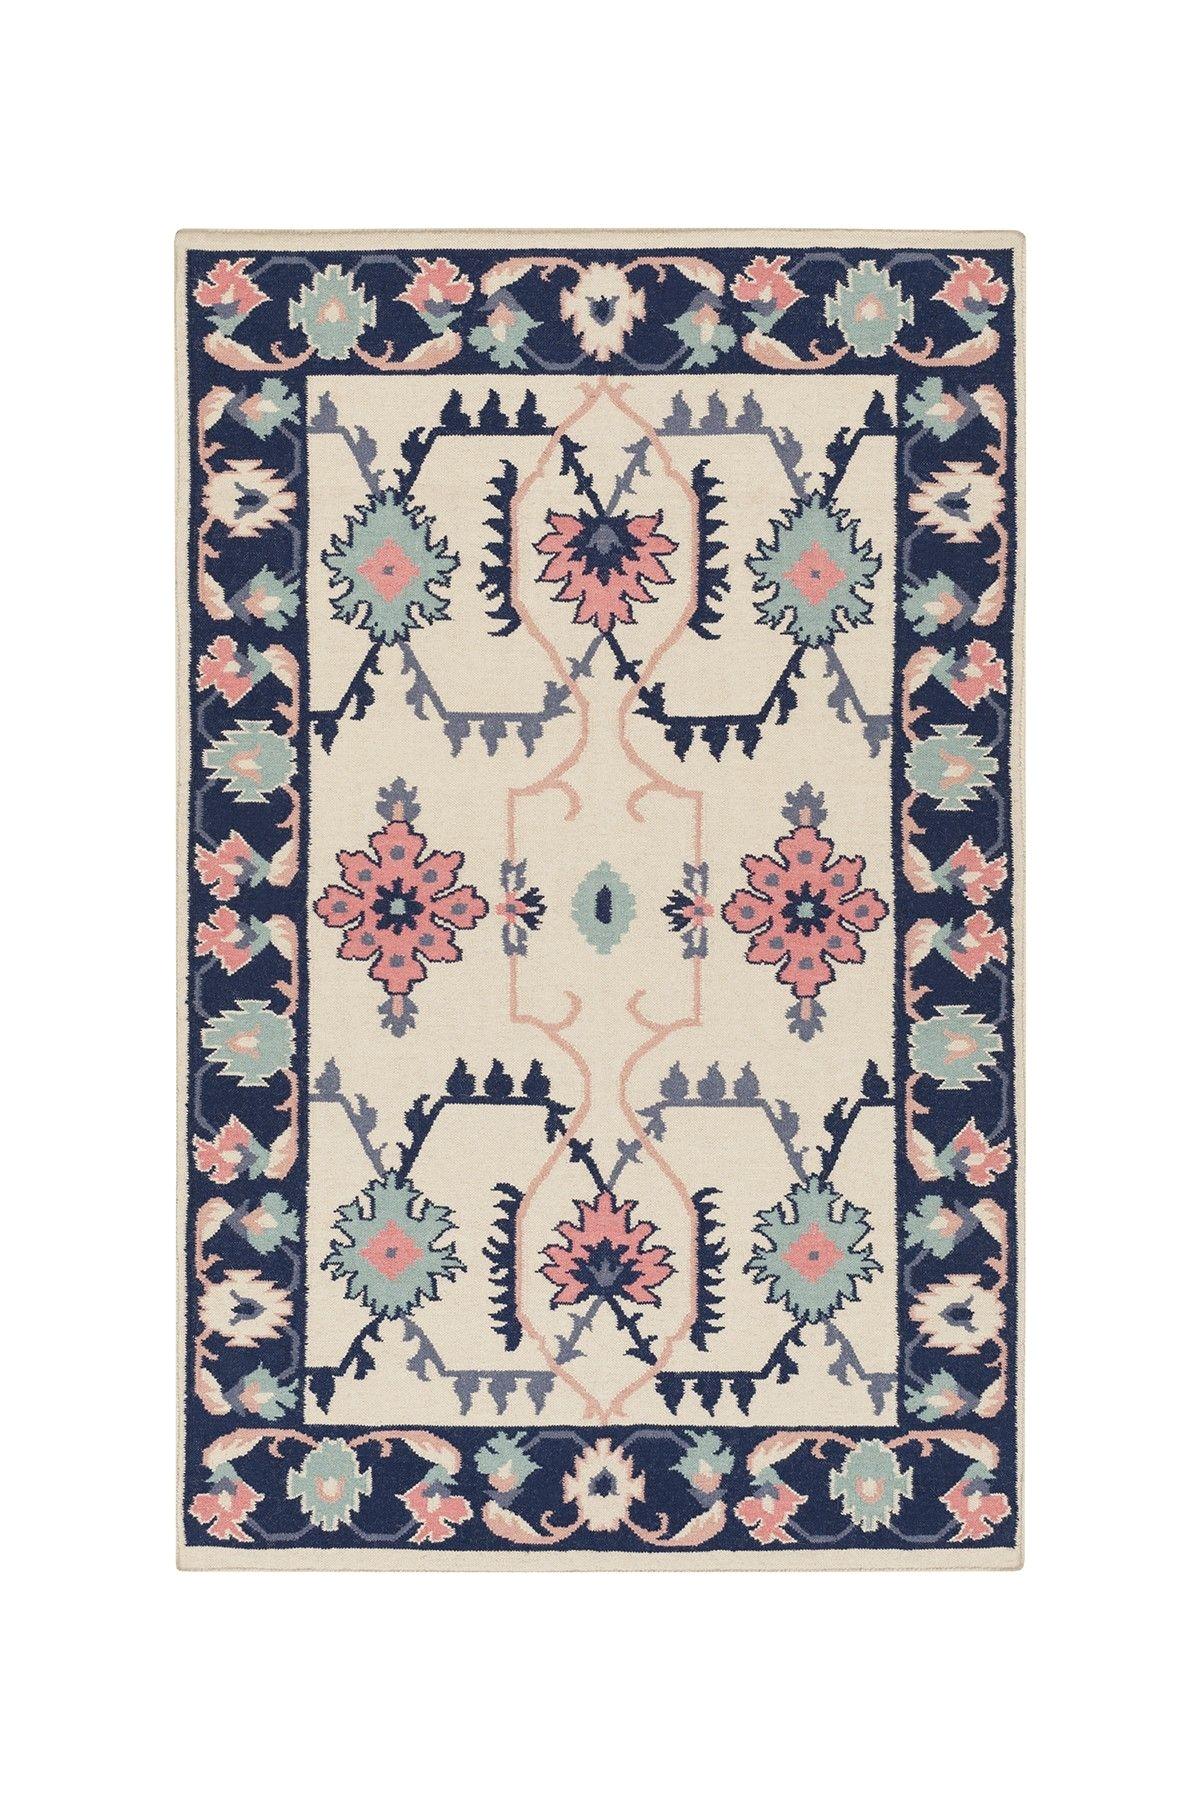 jewel tone ii hard twist wool rug neutral pink blue green on